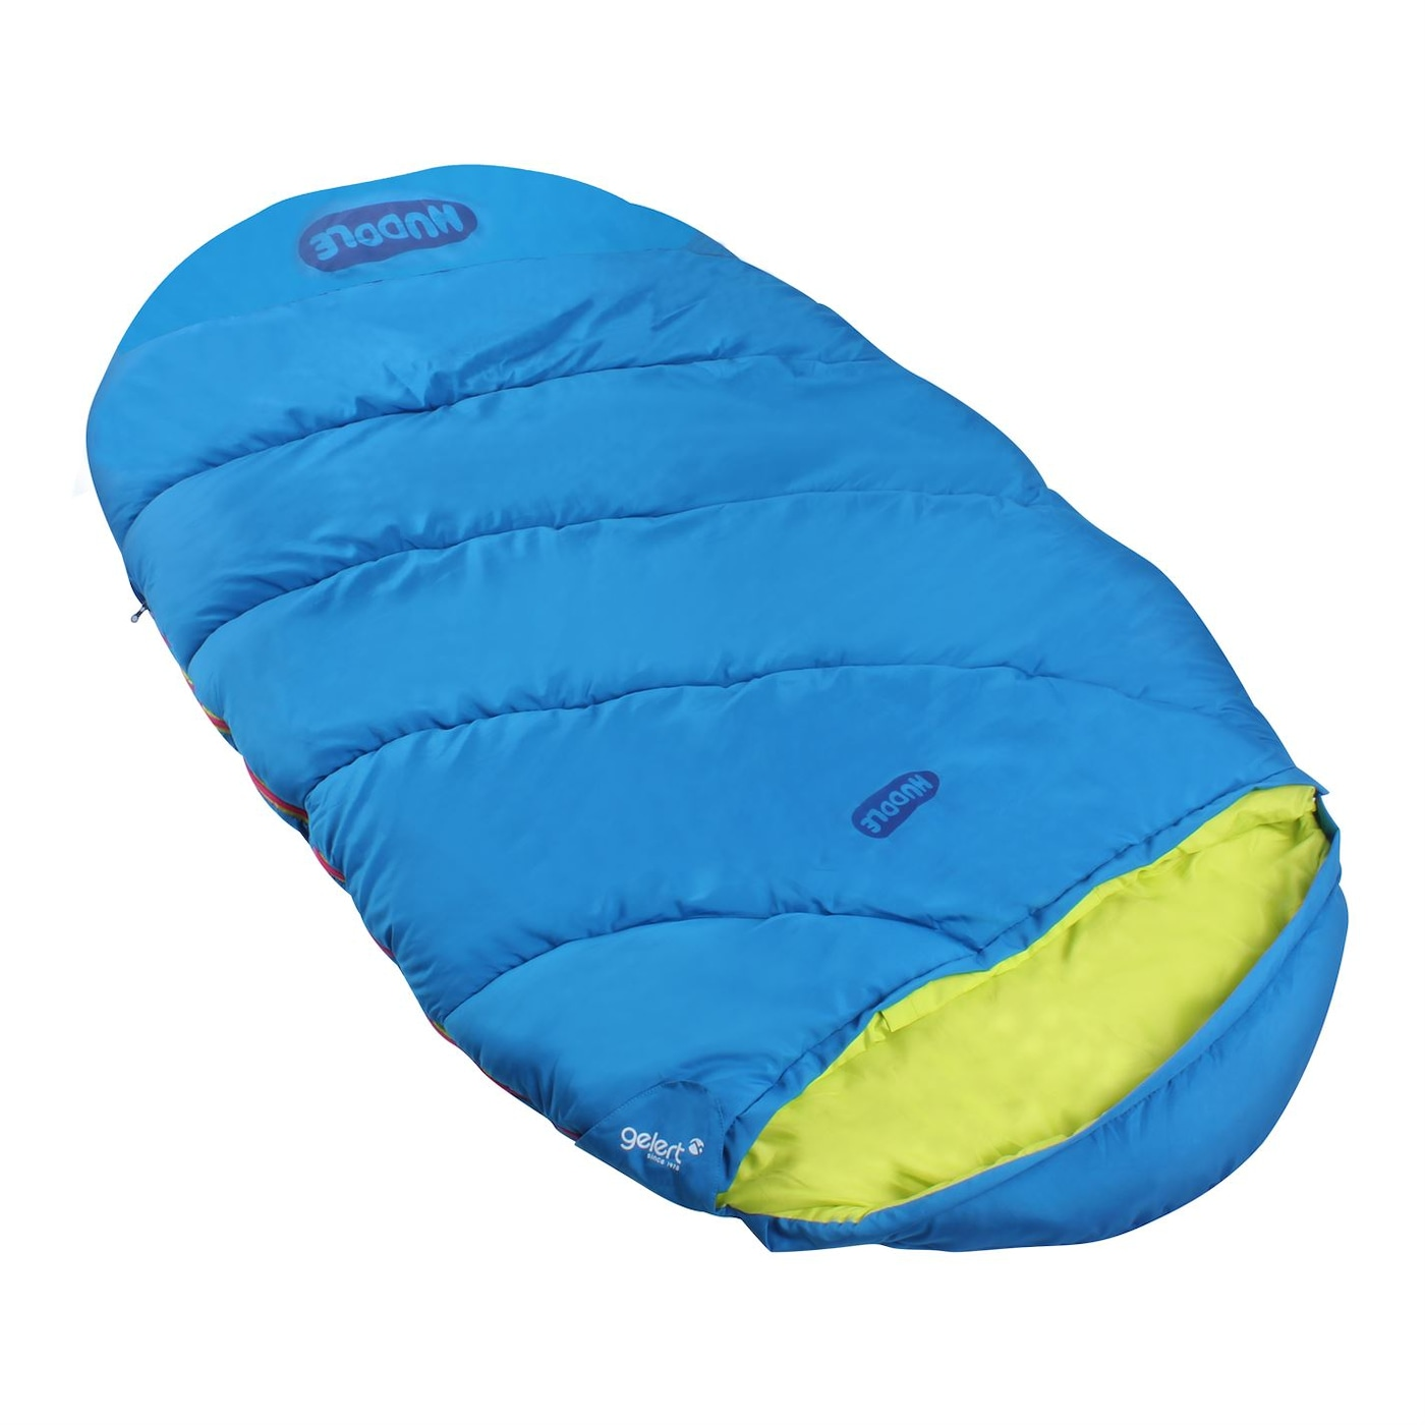 Gelert Huddle Sleeping Bag Junior